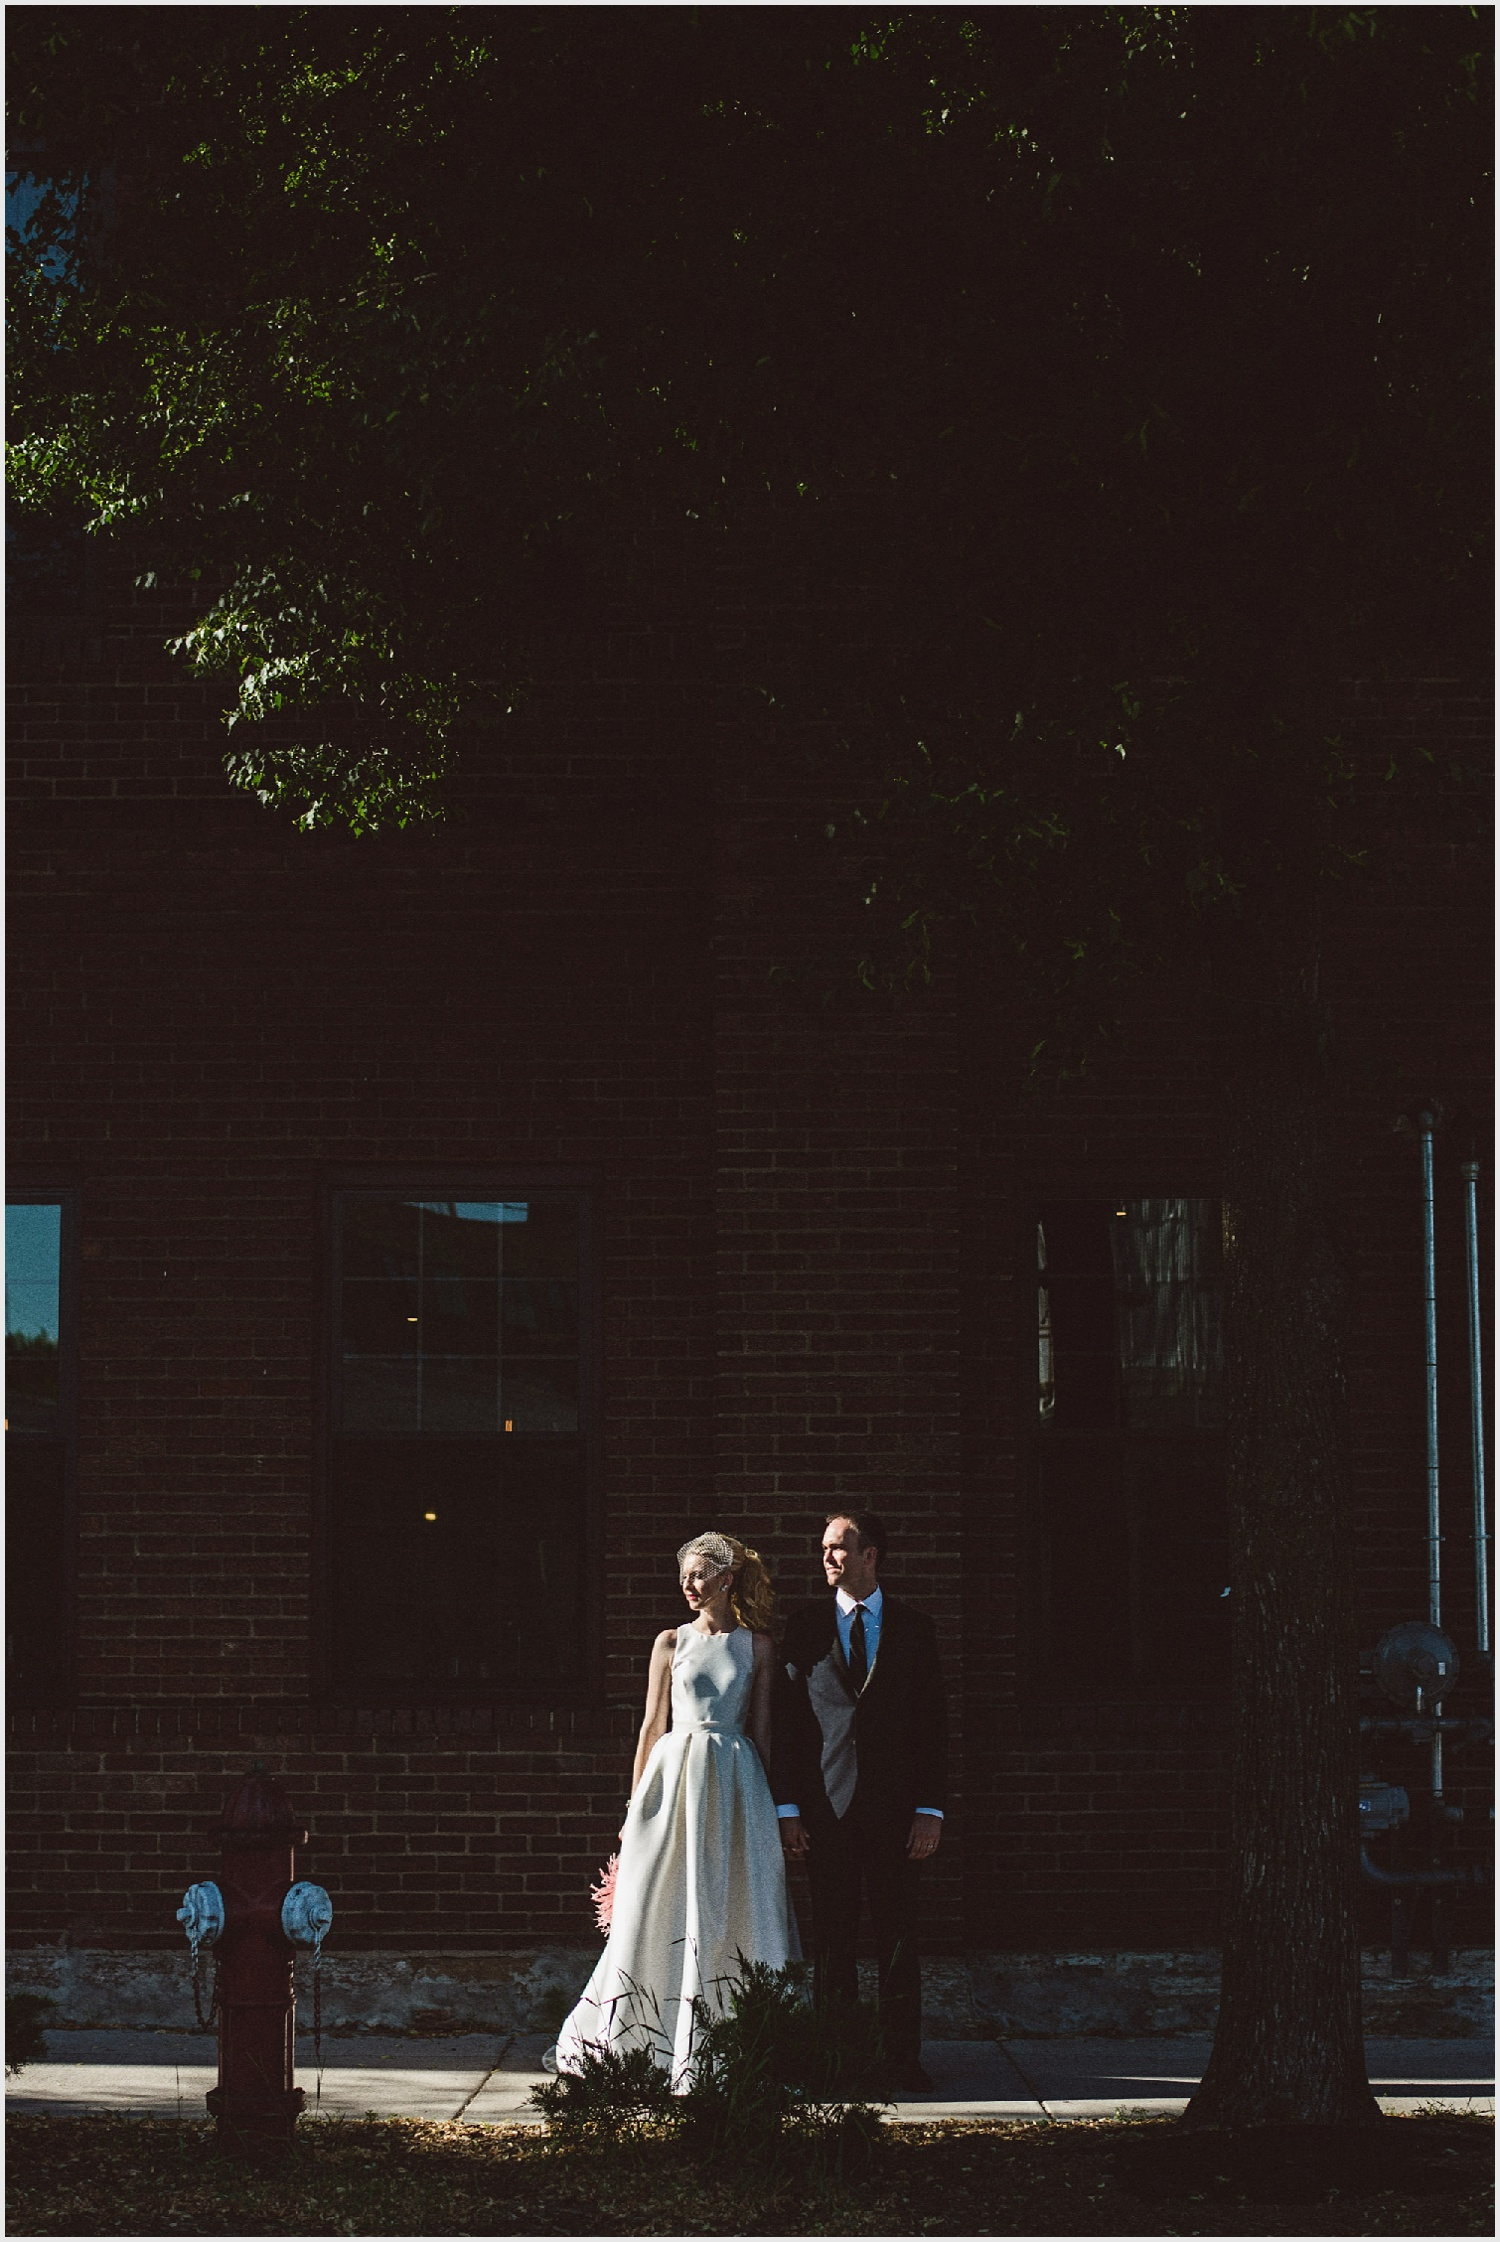 solar_arts_wedding_minneapolis_by_lucas_botz_photography_0050.jpg